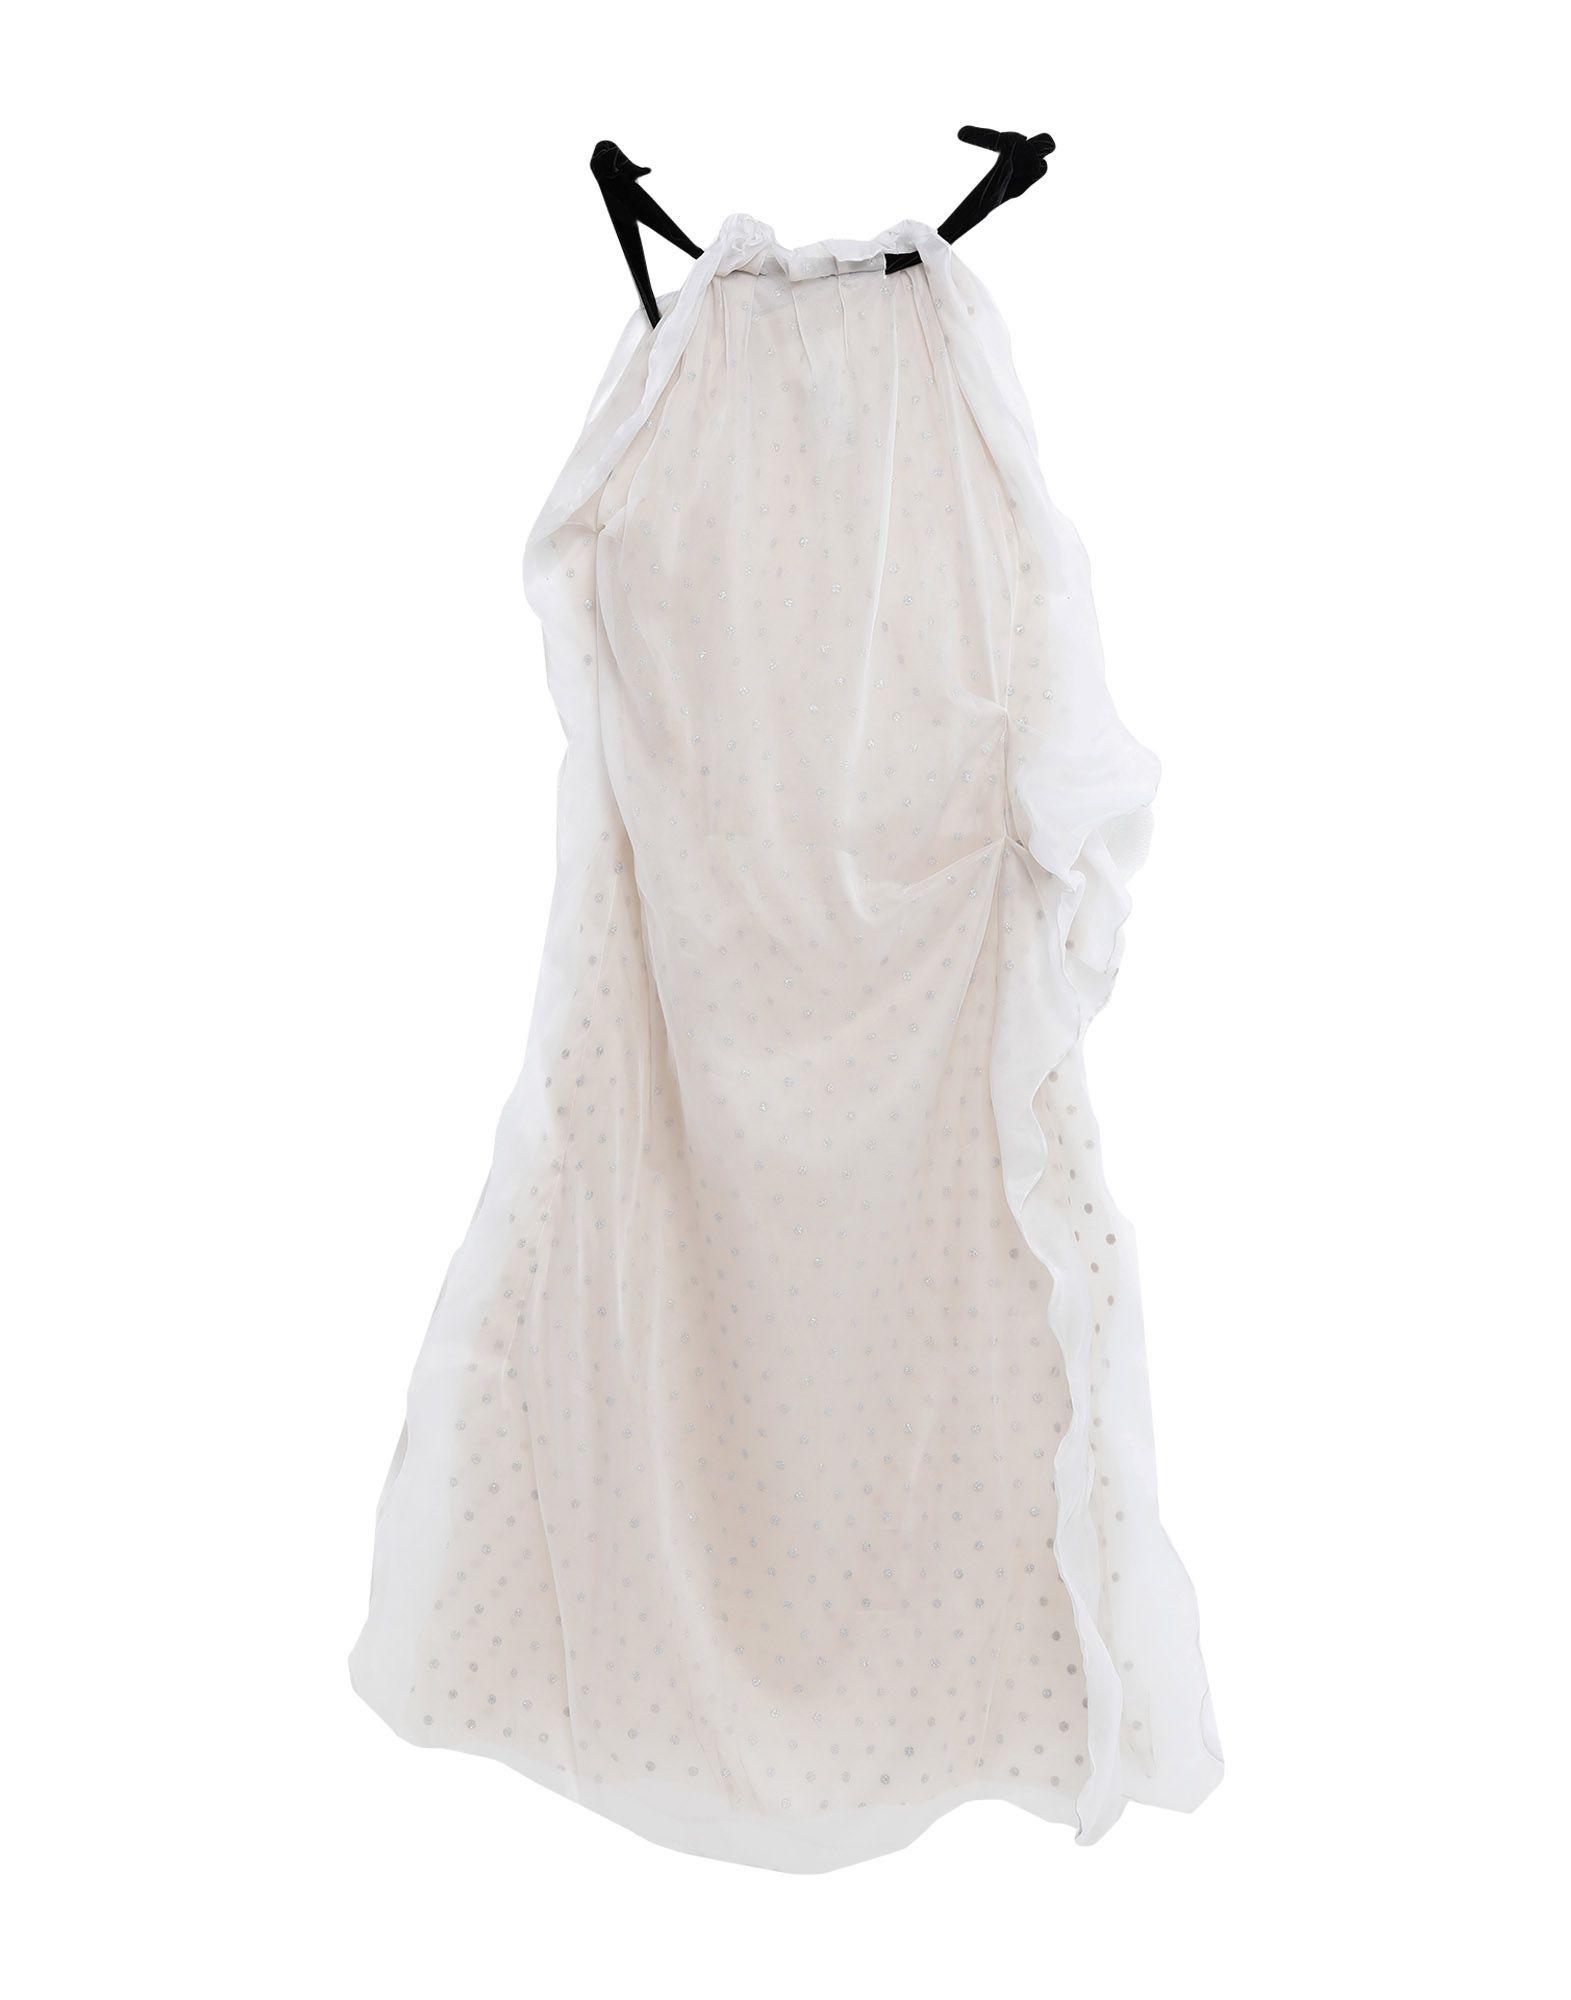 Vestito In Seta Maison Margiela damen - 34968298QW